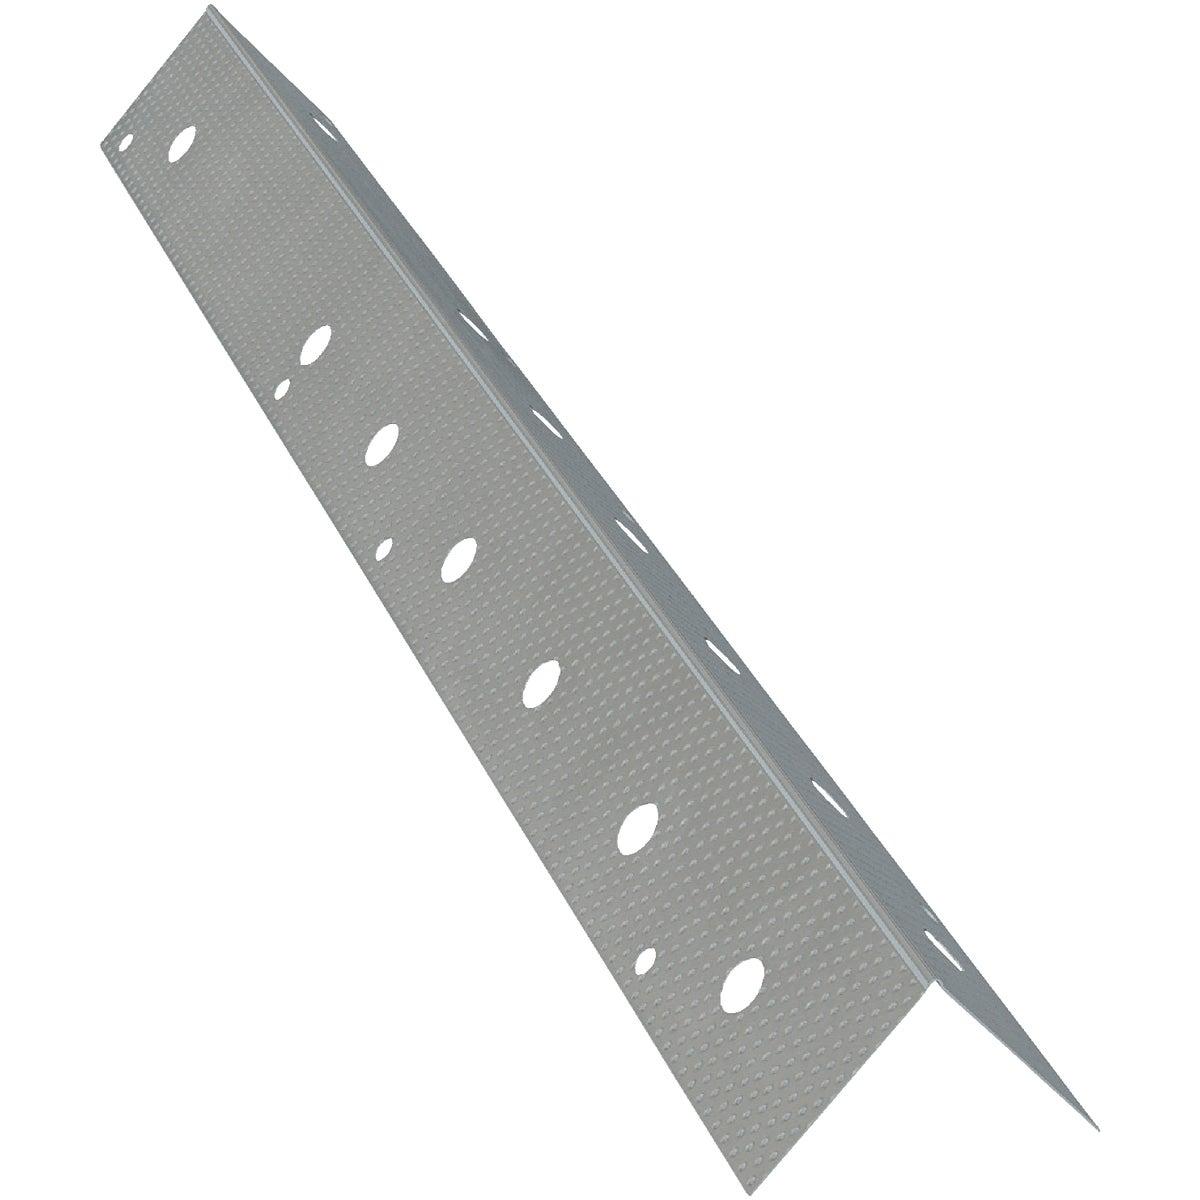 Deluxe Drywall Metal Corner Bead